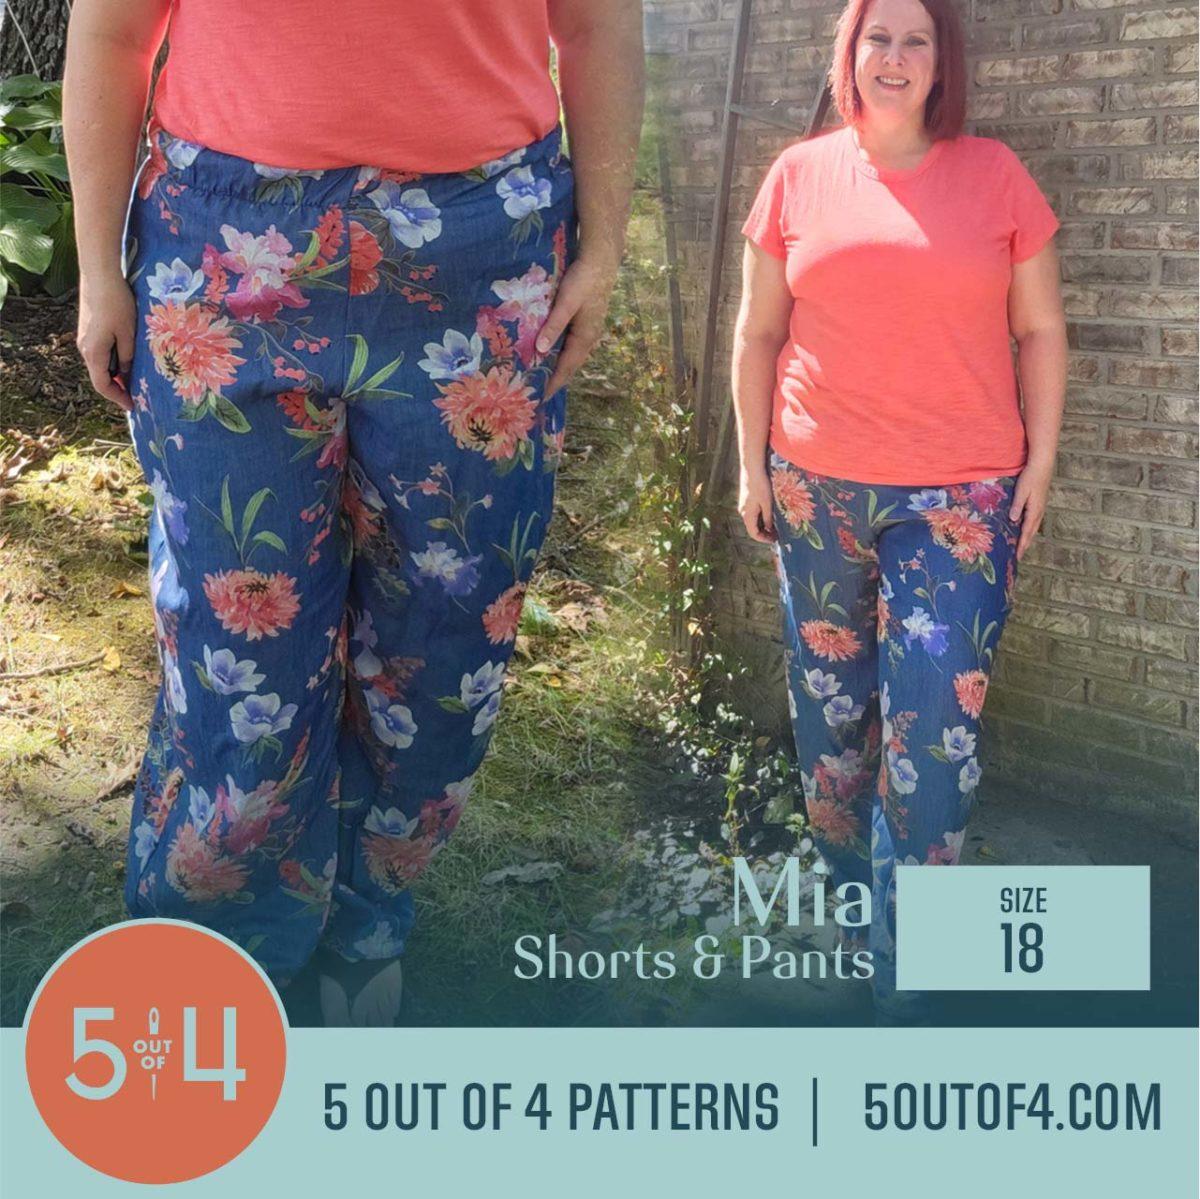 5oo4 Patterns Mia Pants Size 18